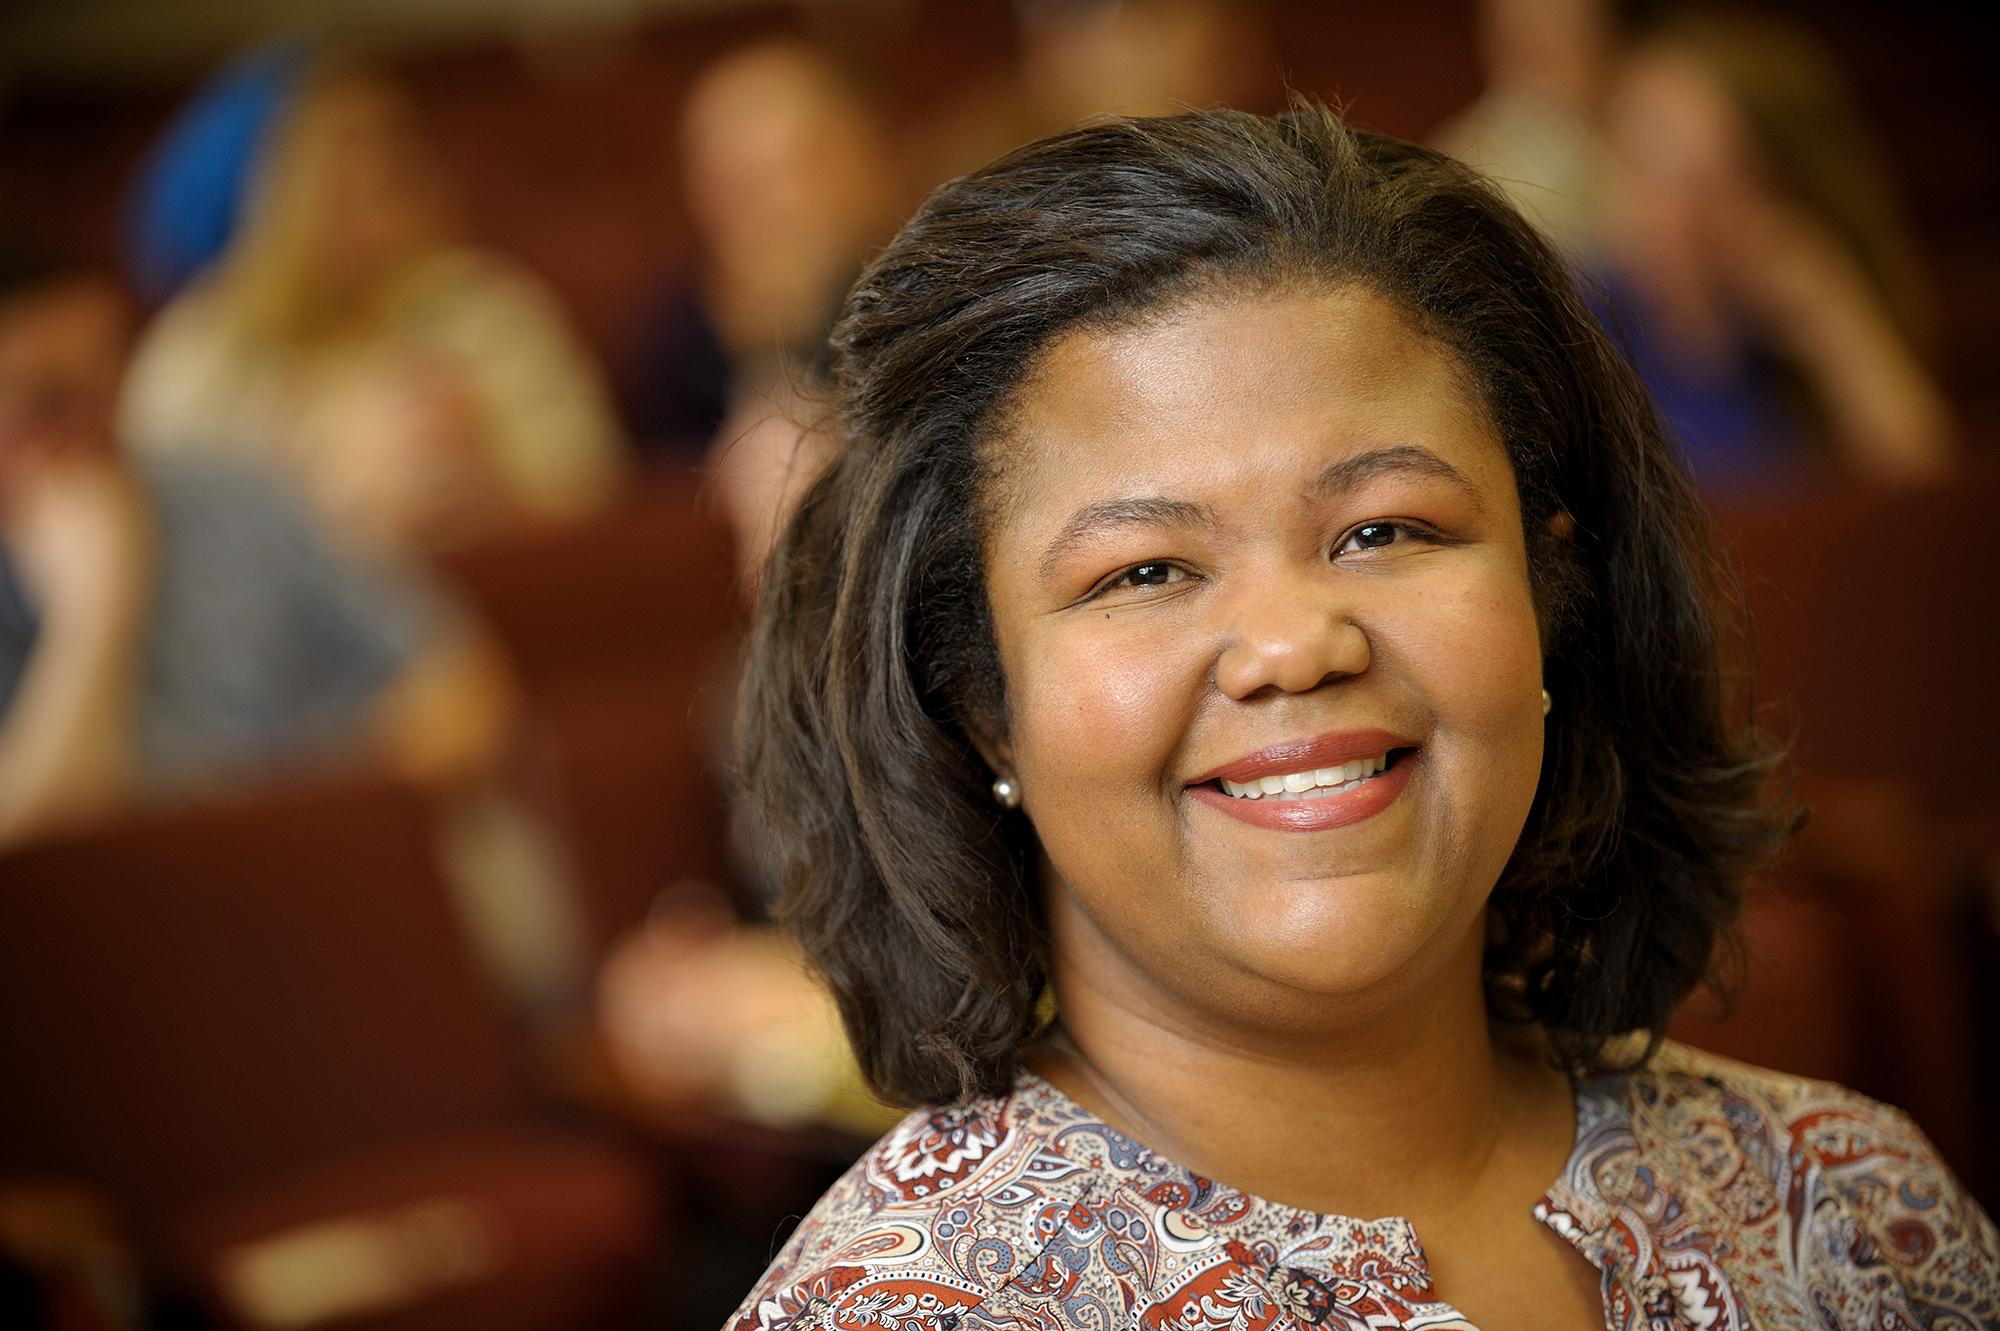 Nicole A. Cooke